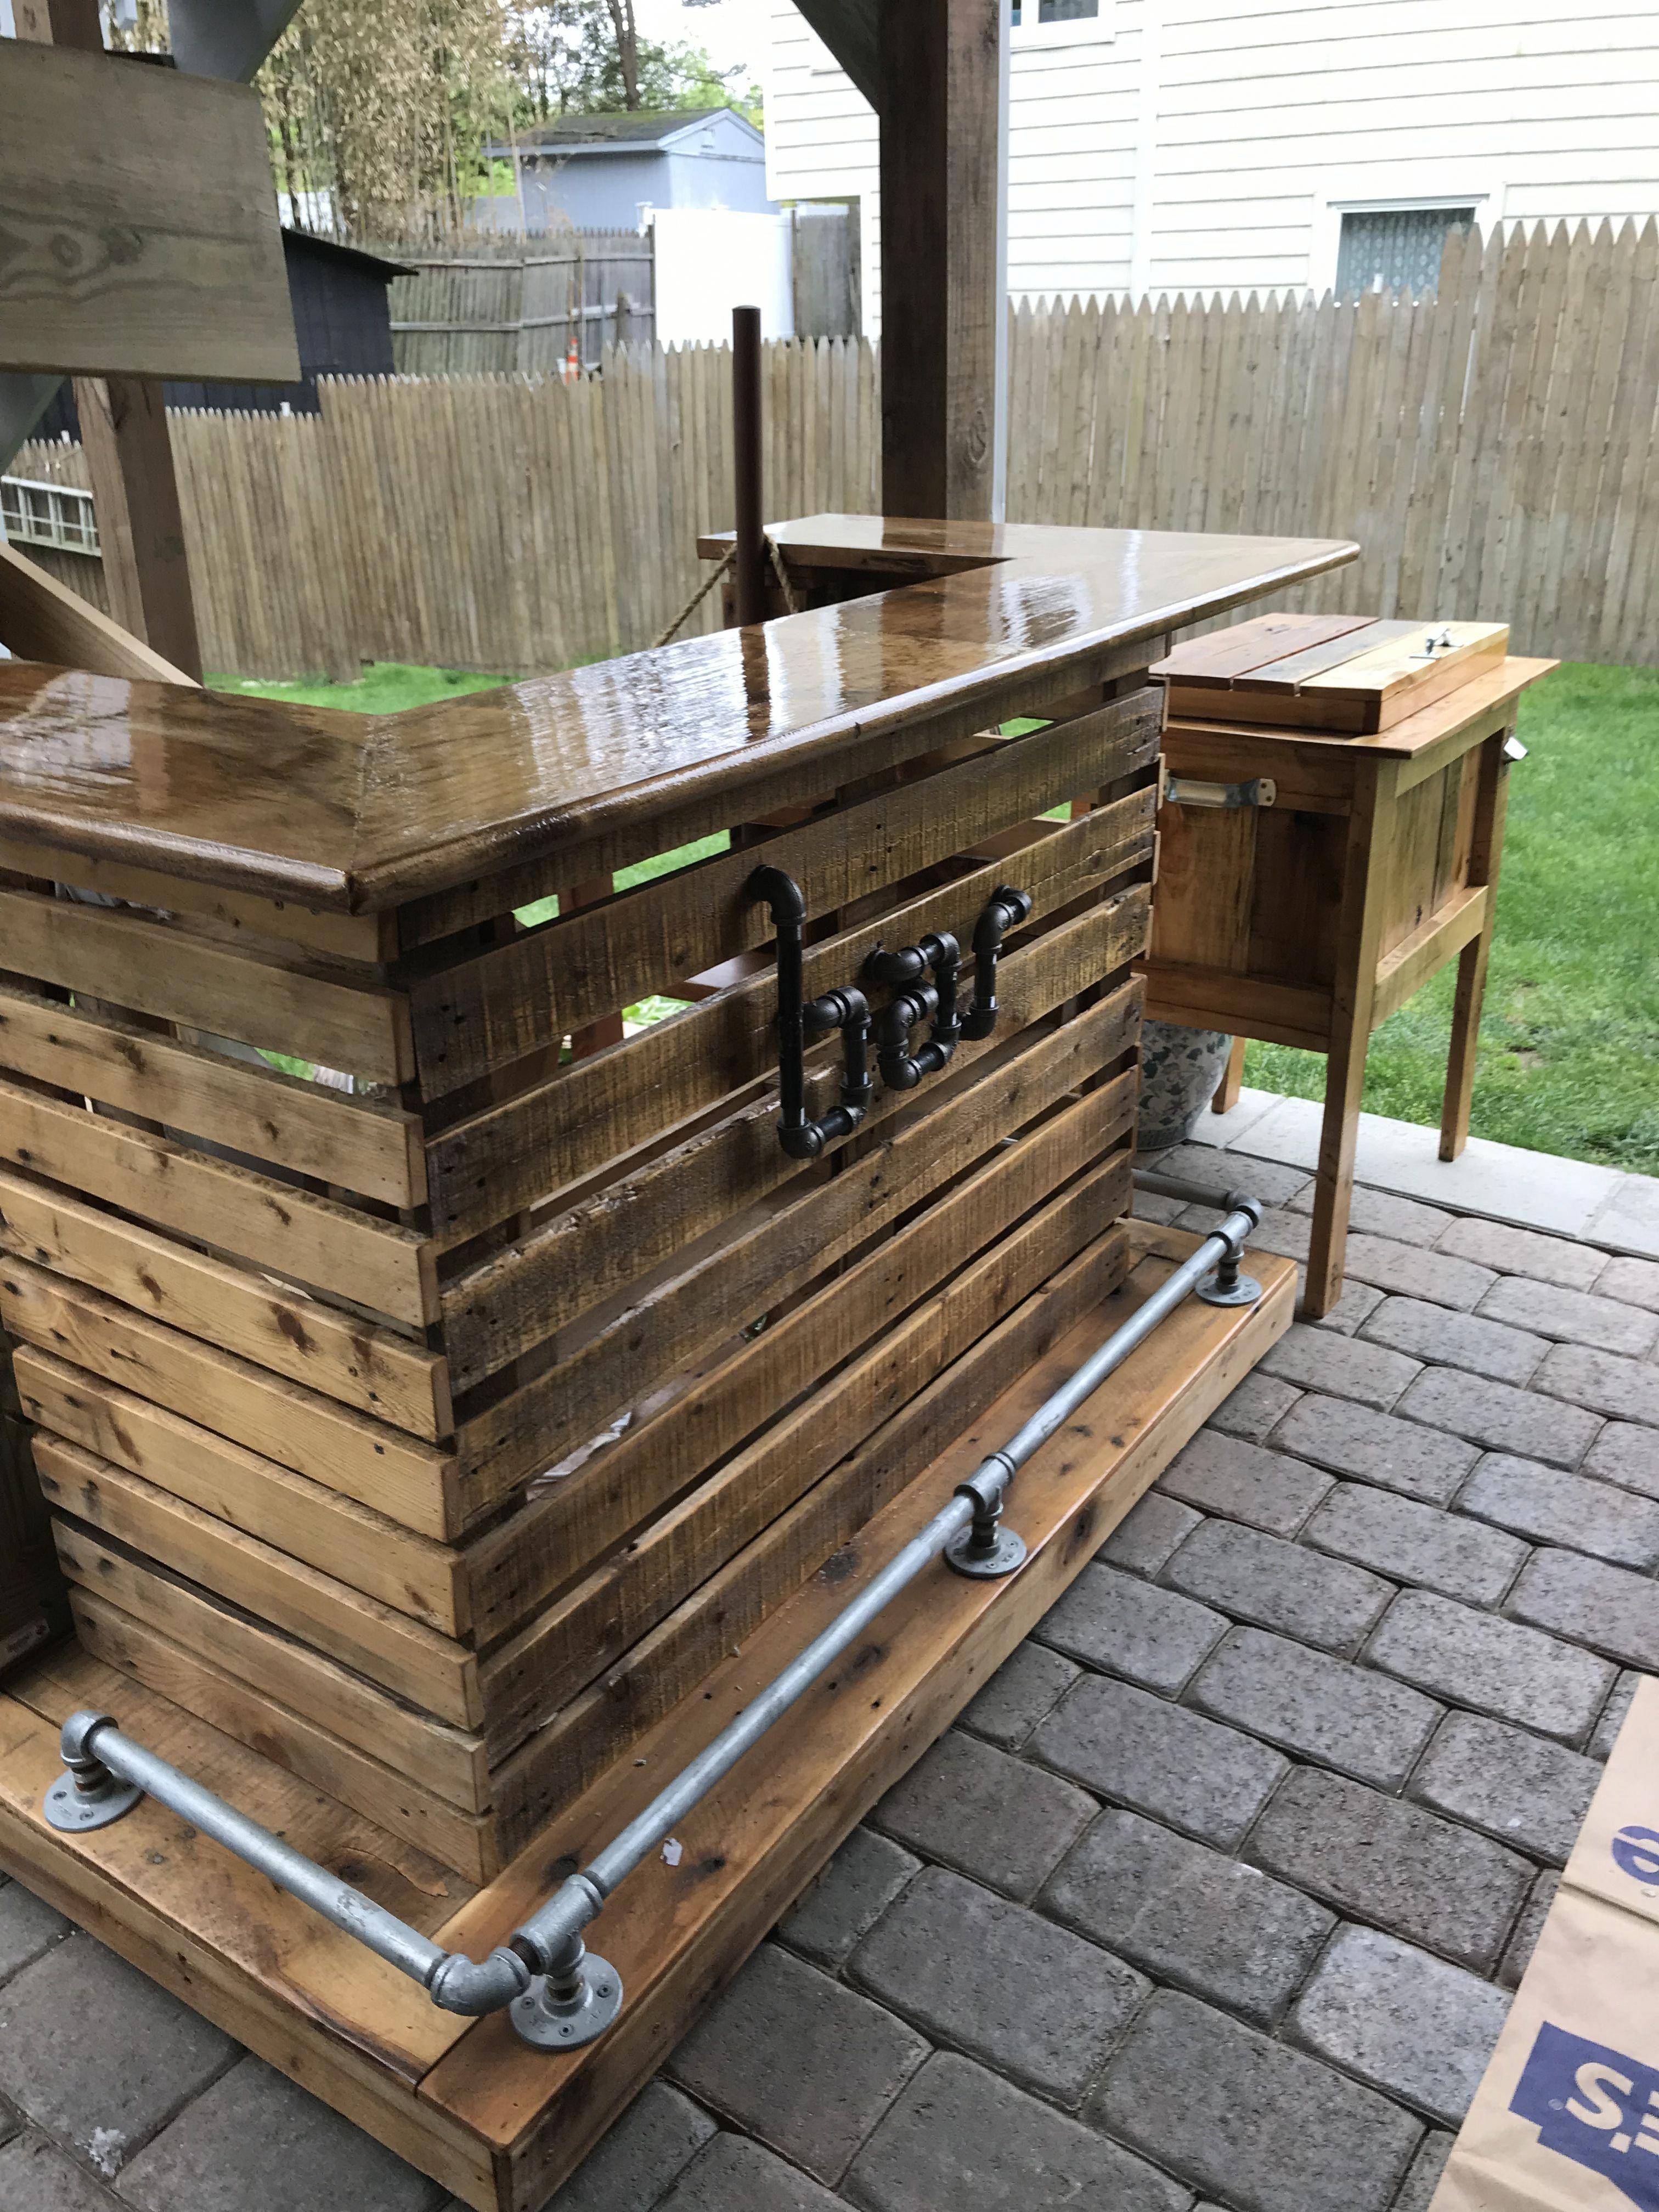 Furniture Guide For Minecraft Furnitureonline Outsidefurniture Diy Outdoor Bar Outdoor Patio Bar Wood Pallet Bar